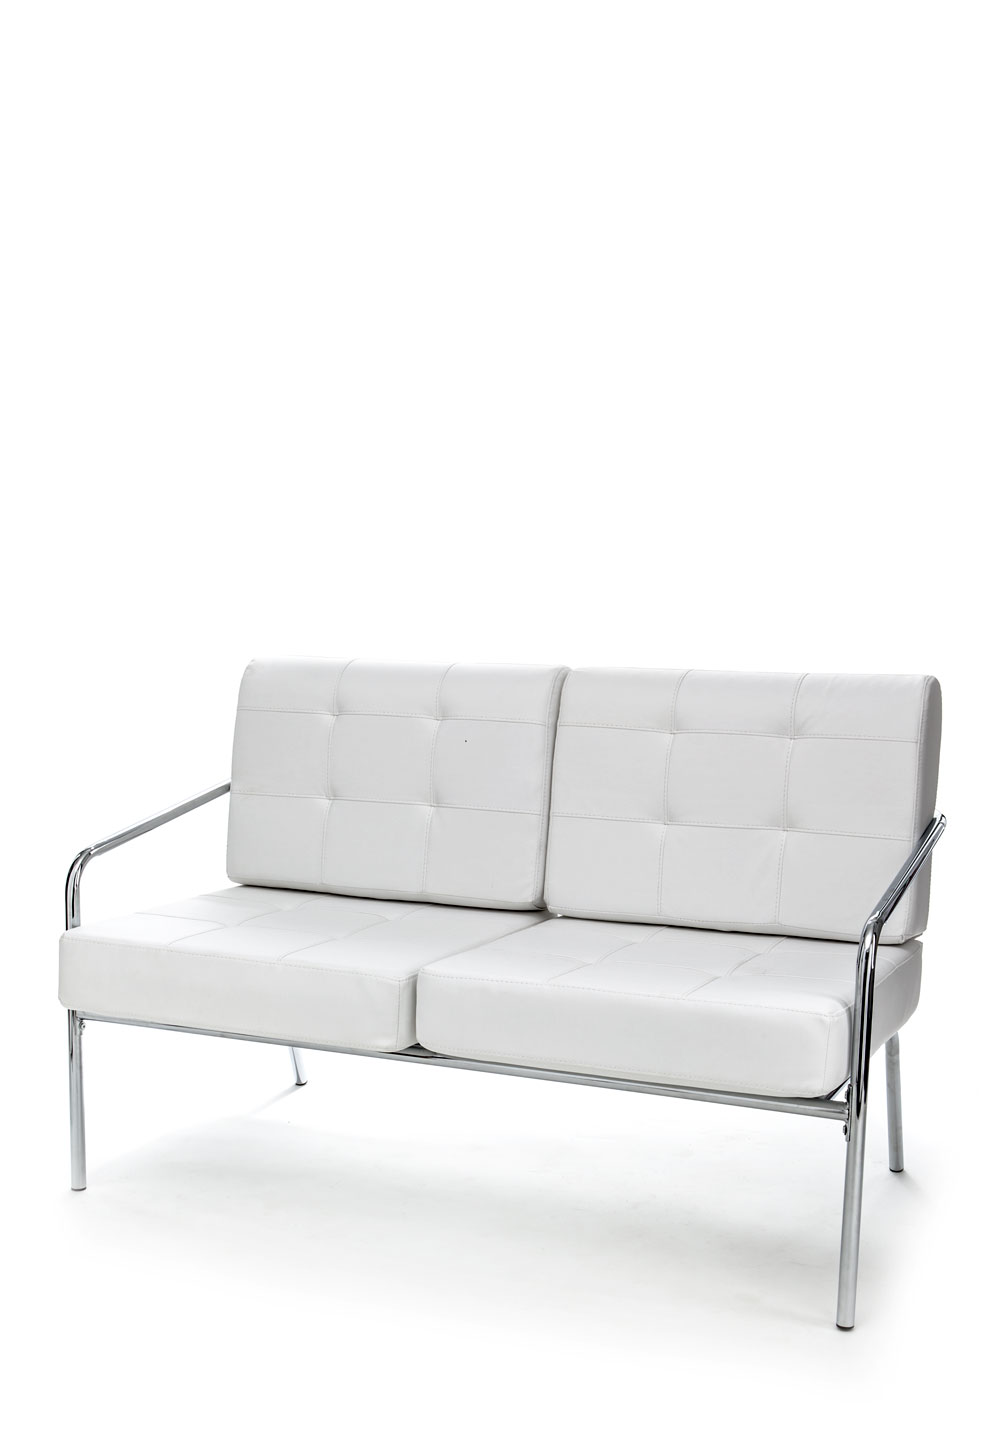 Canapea fixa Jazz White